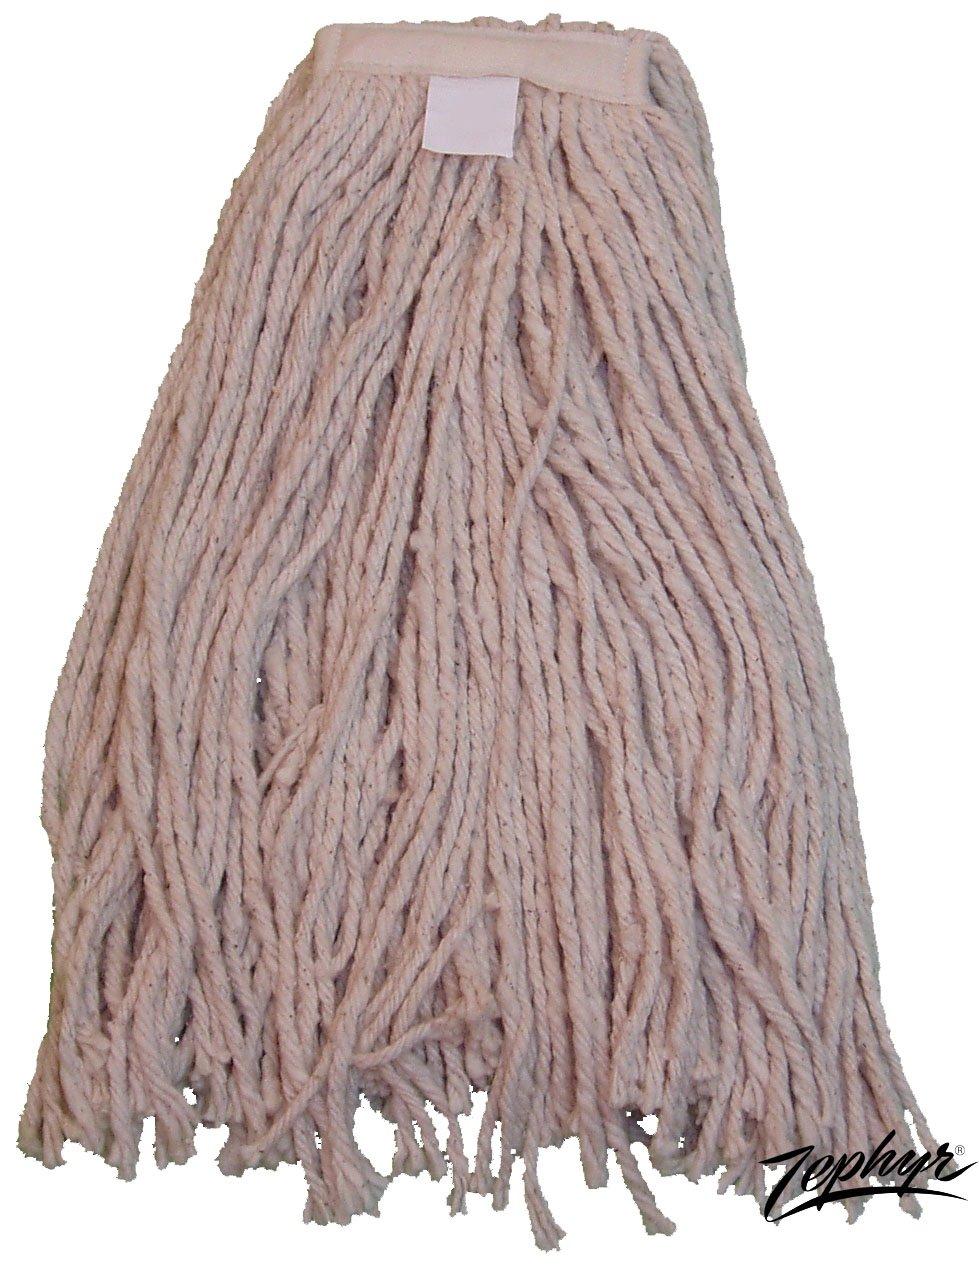 Zephyr 9005 BBL Cotton Wet Mop Head, #24 Size (Pack of 12)